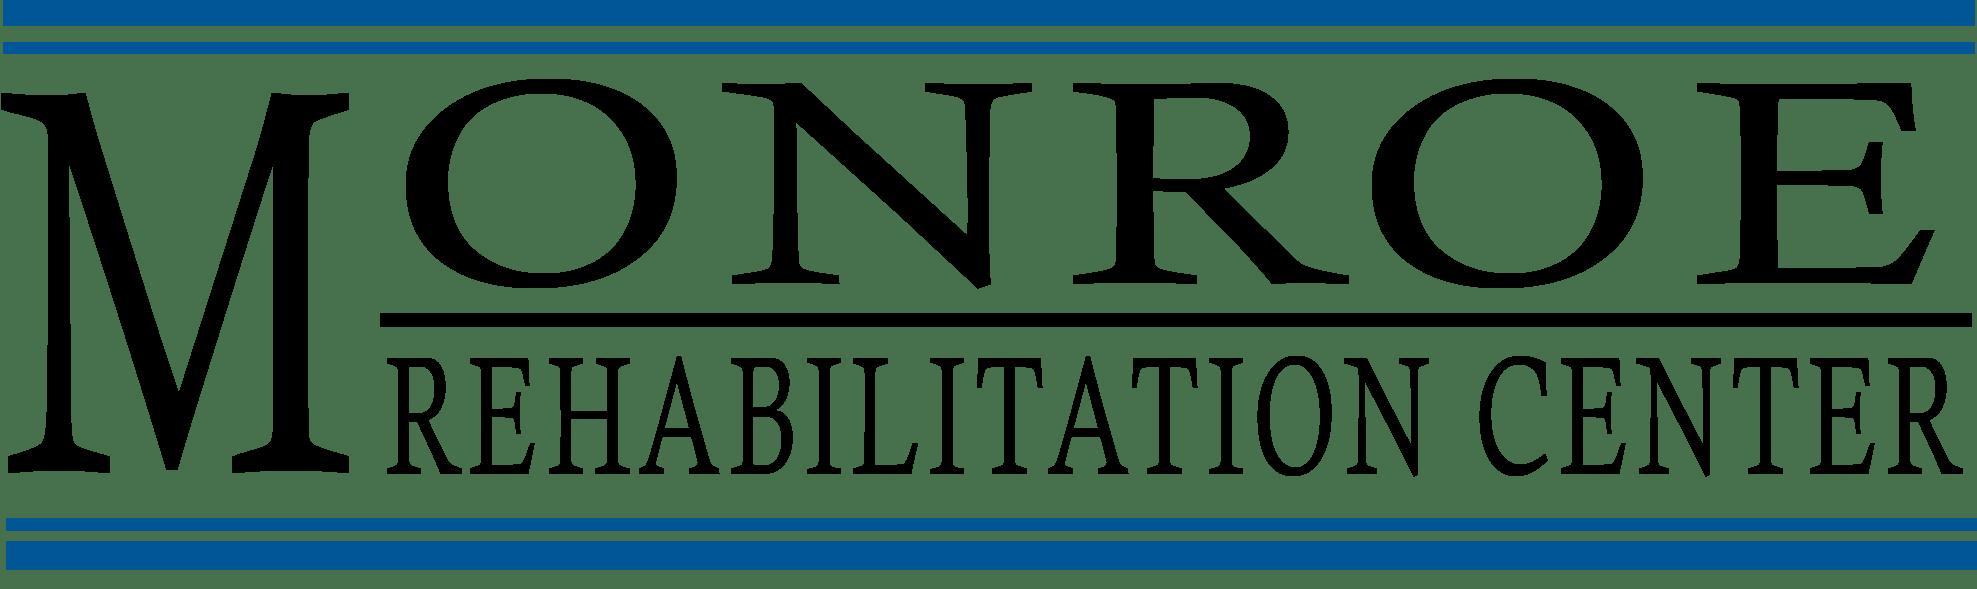 Monroe Rehabilitation Center logo